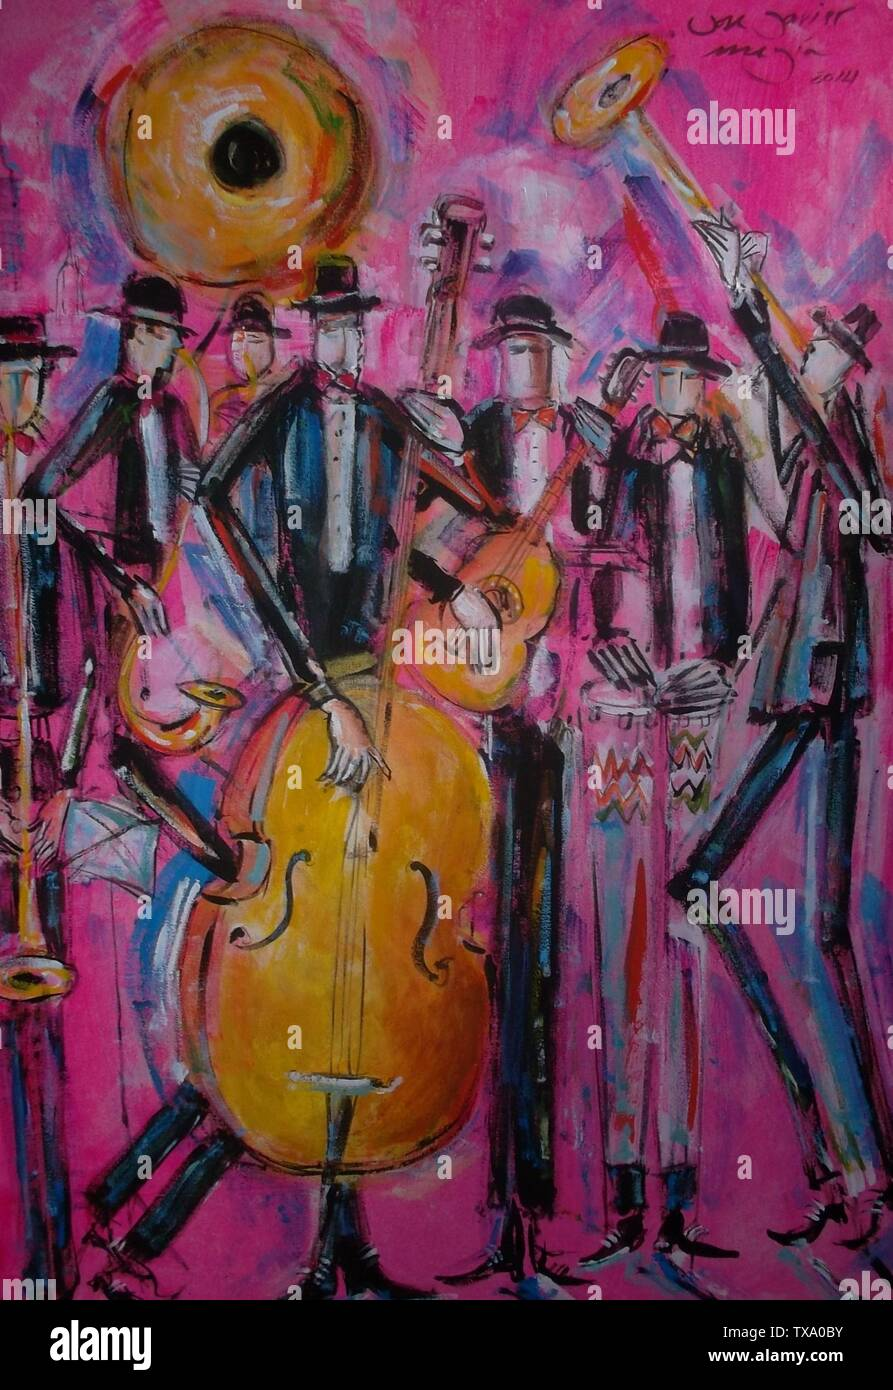 Español: Músicos de Jazz Latino Public domainPublic